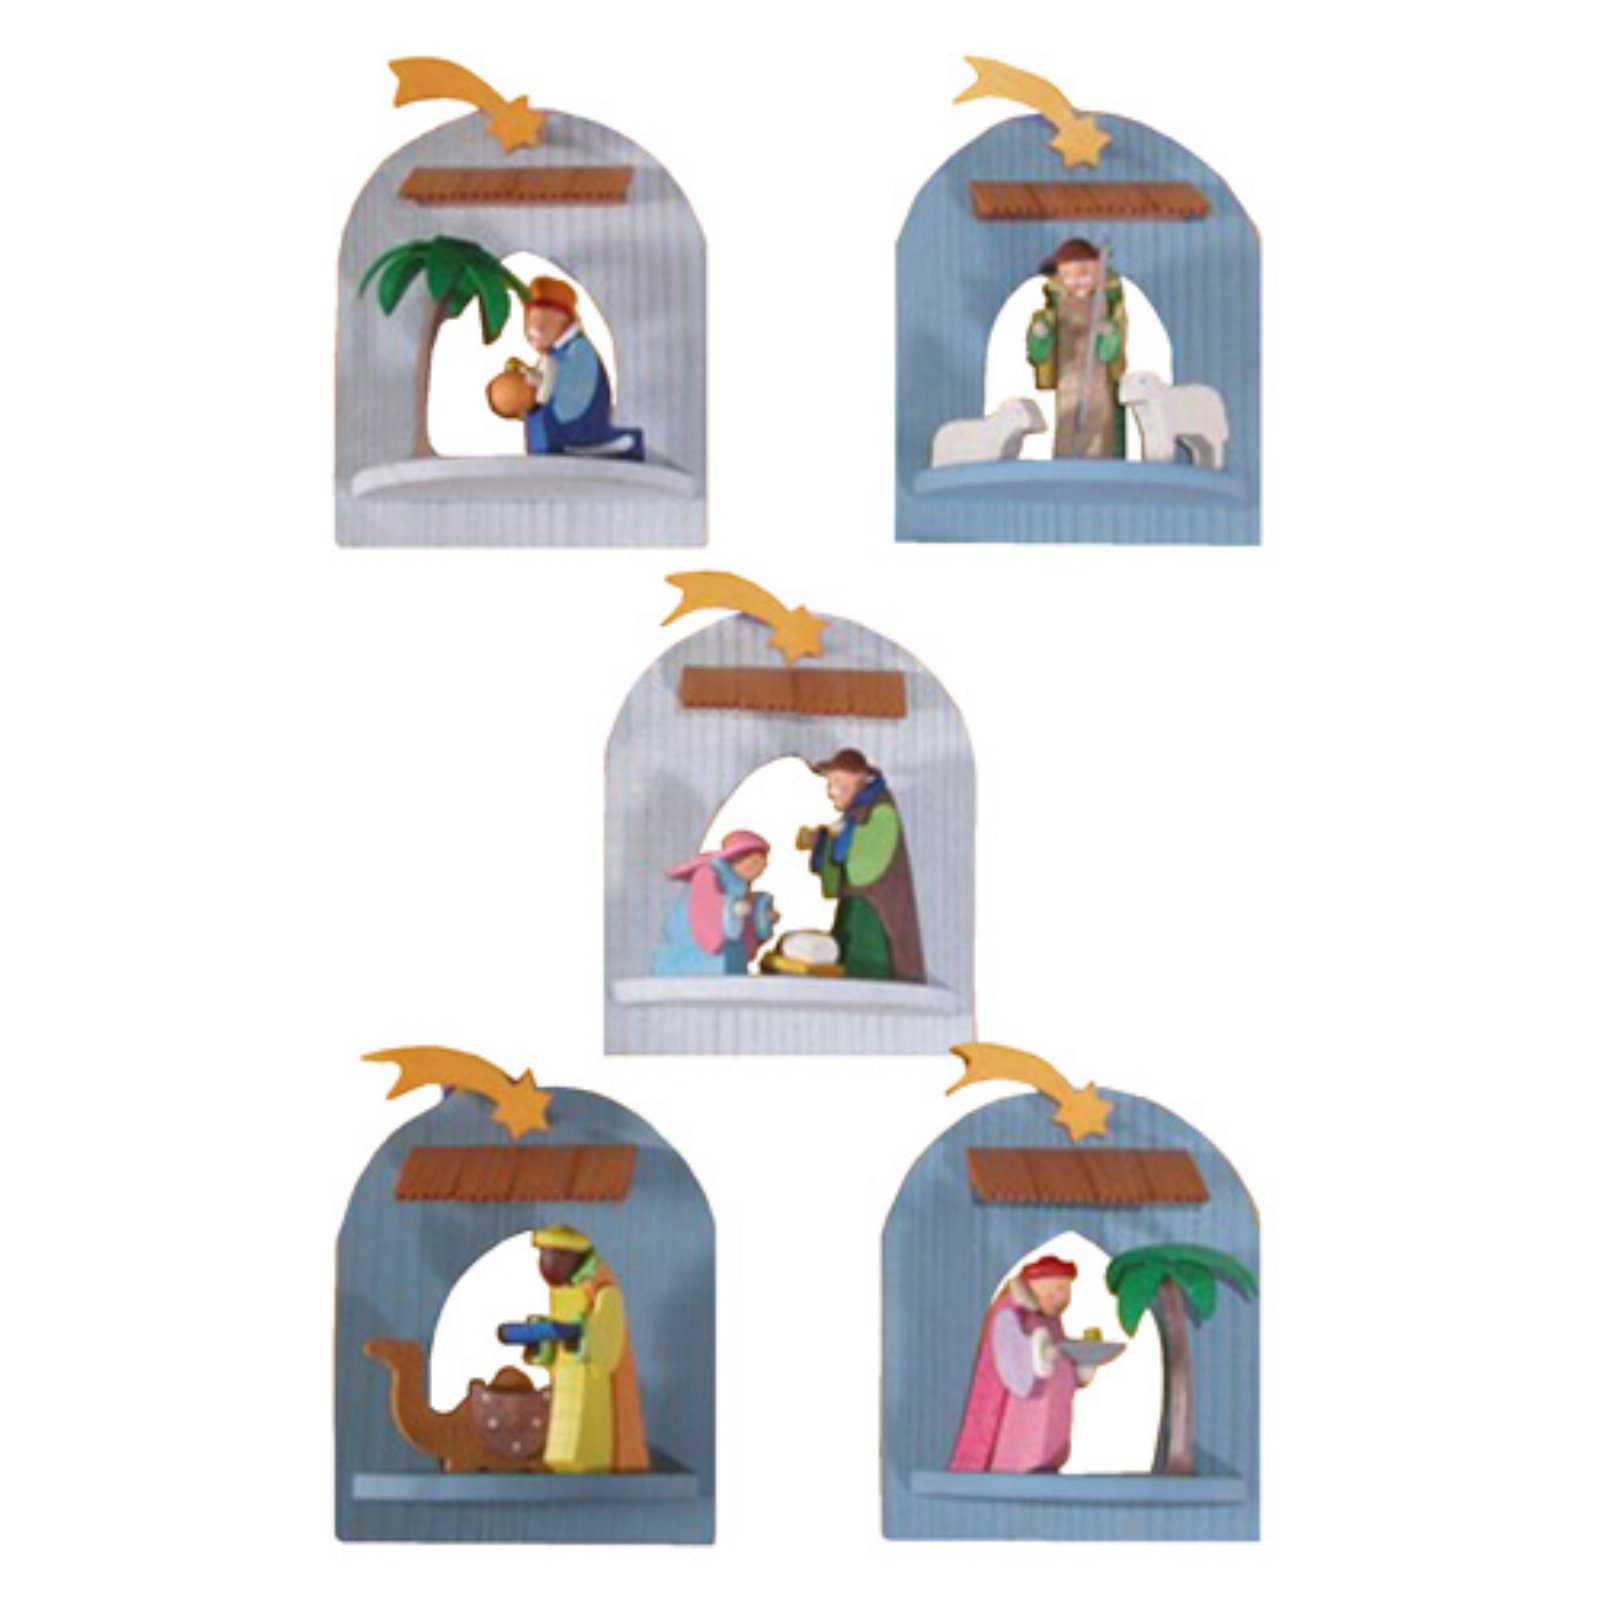 Graupner 3.25 in. Assorted Nativity Scene Ornaments - Set of 5